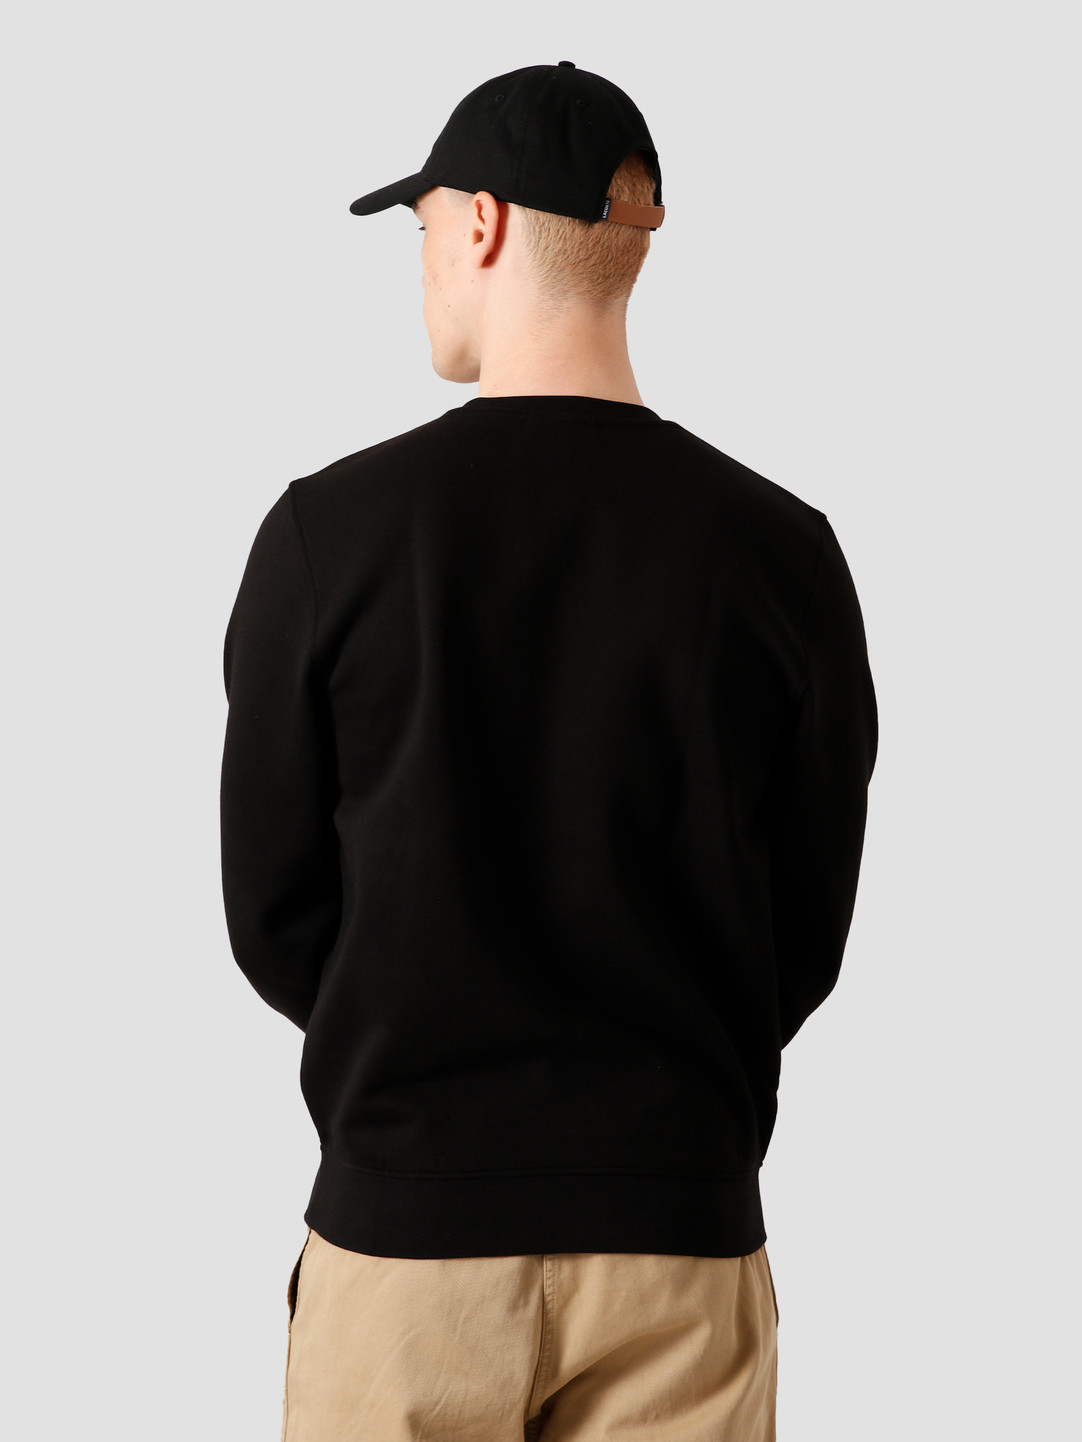 Lacoste Lacoste 1Hs1 Men'S Sweatshirt 011 Black Sh7613-91